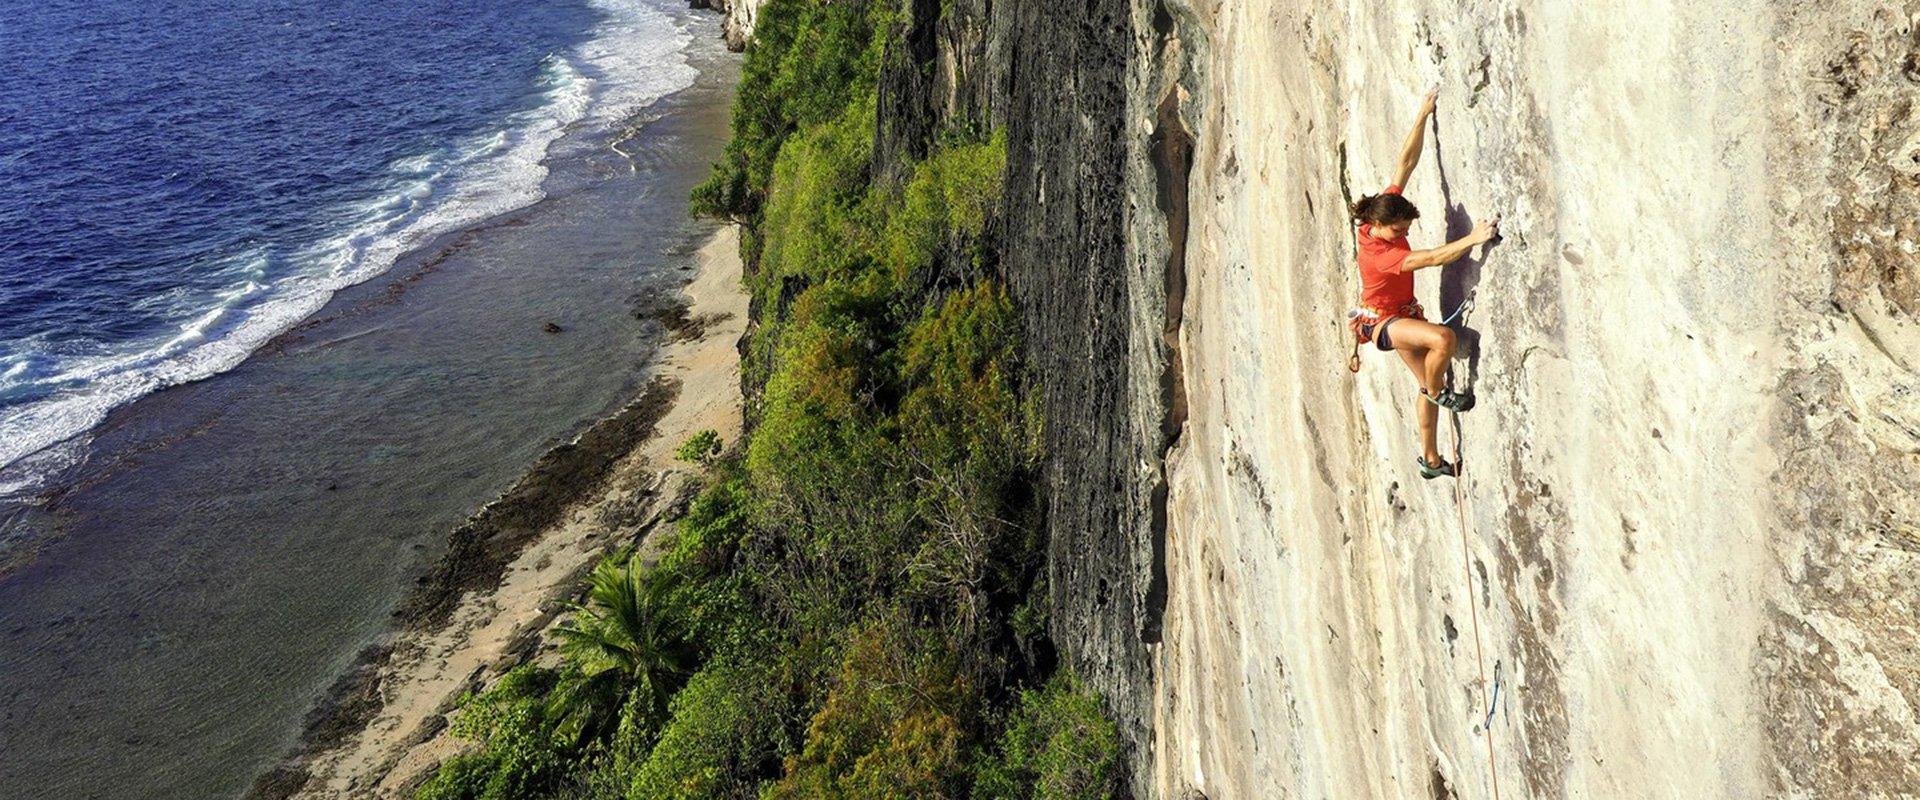 vimff fall series climbing show makatea title bg